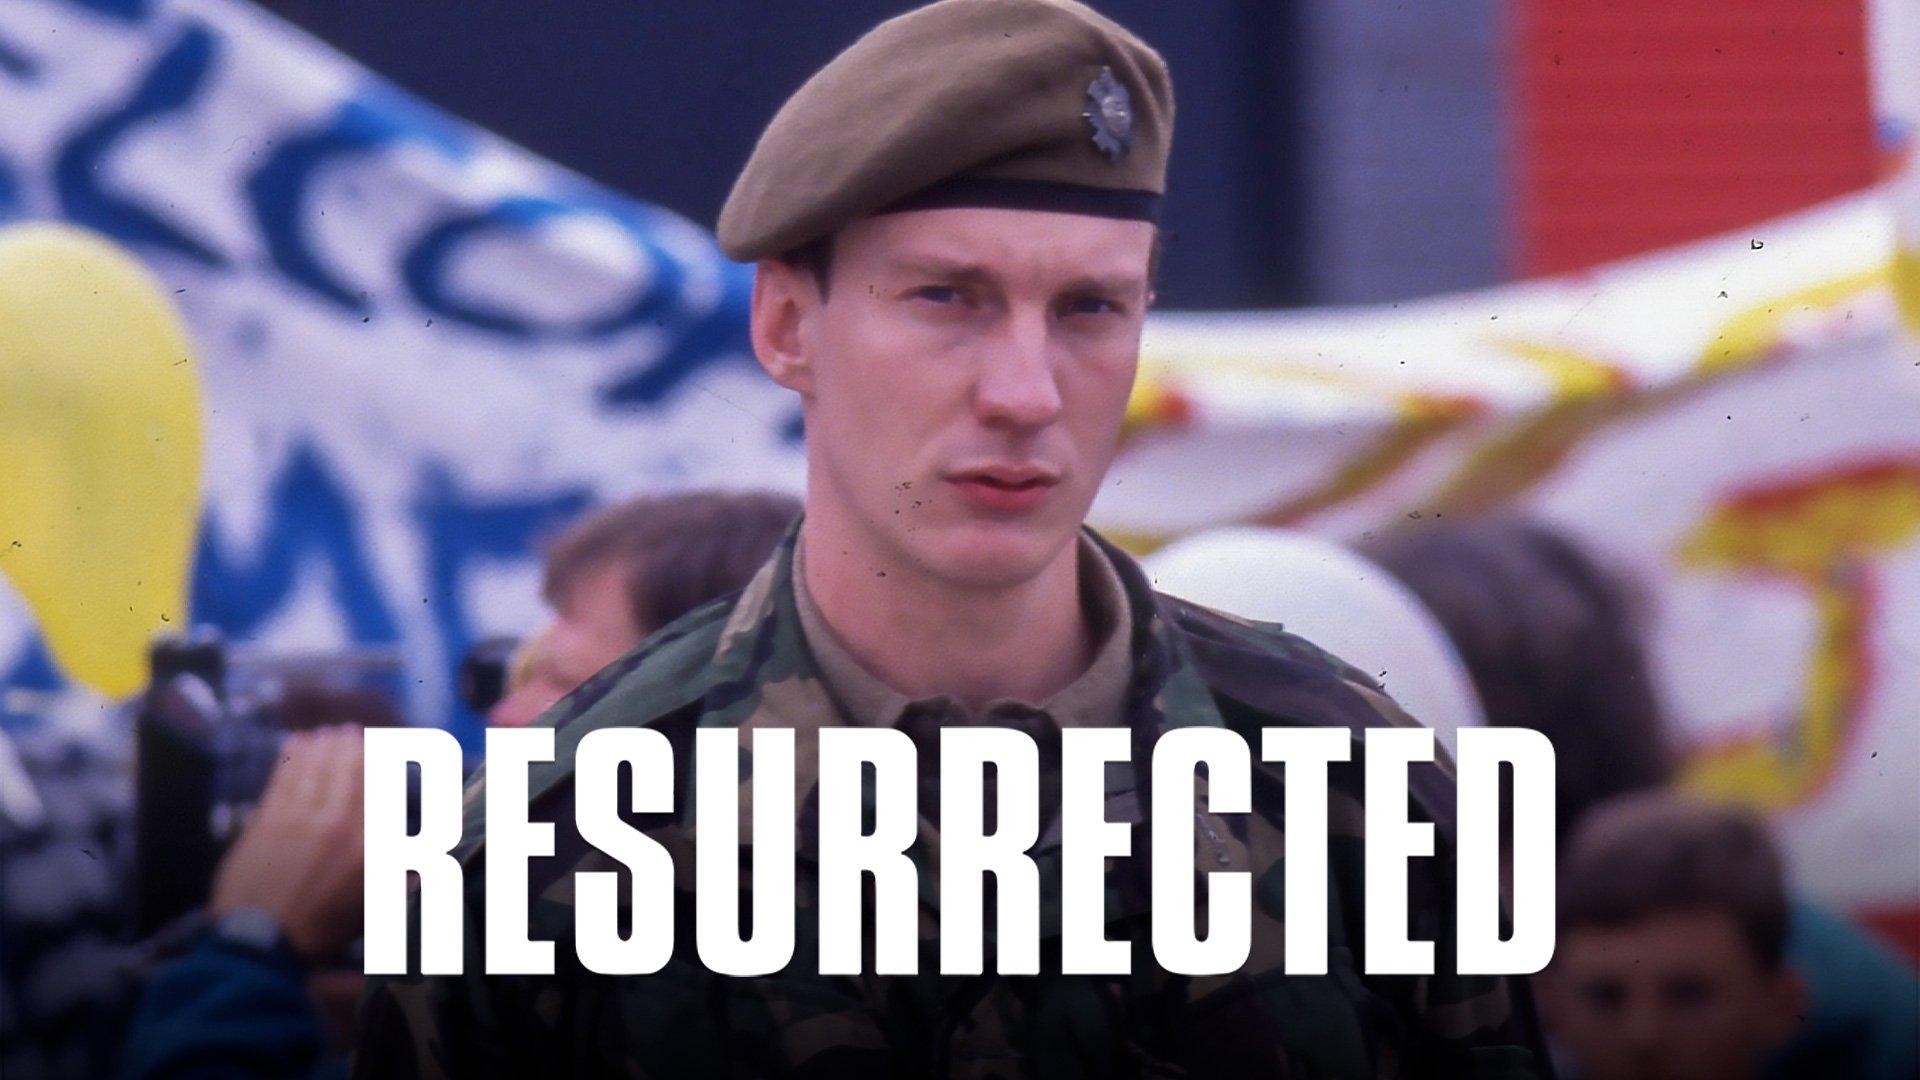 Resurrected on BritBox UK